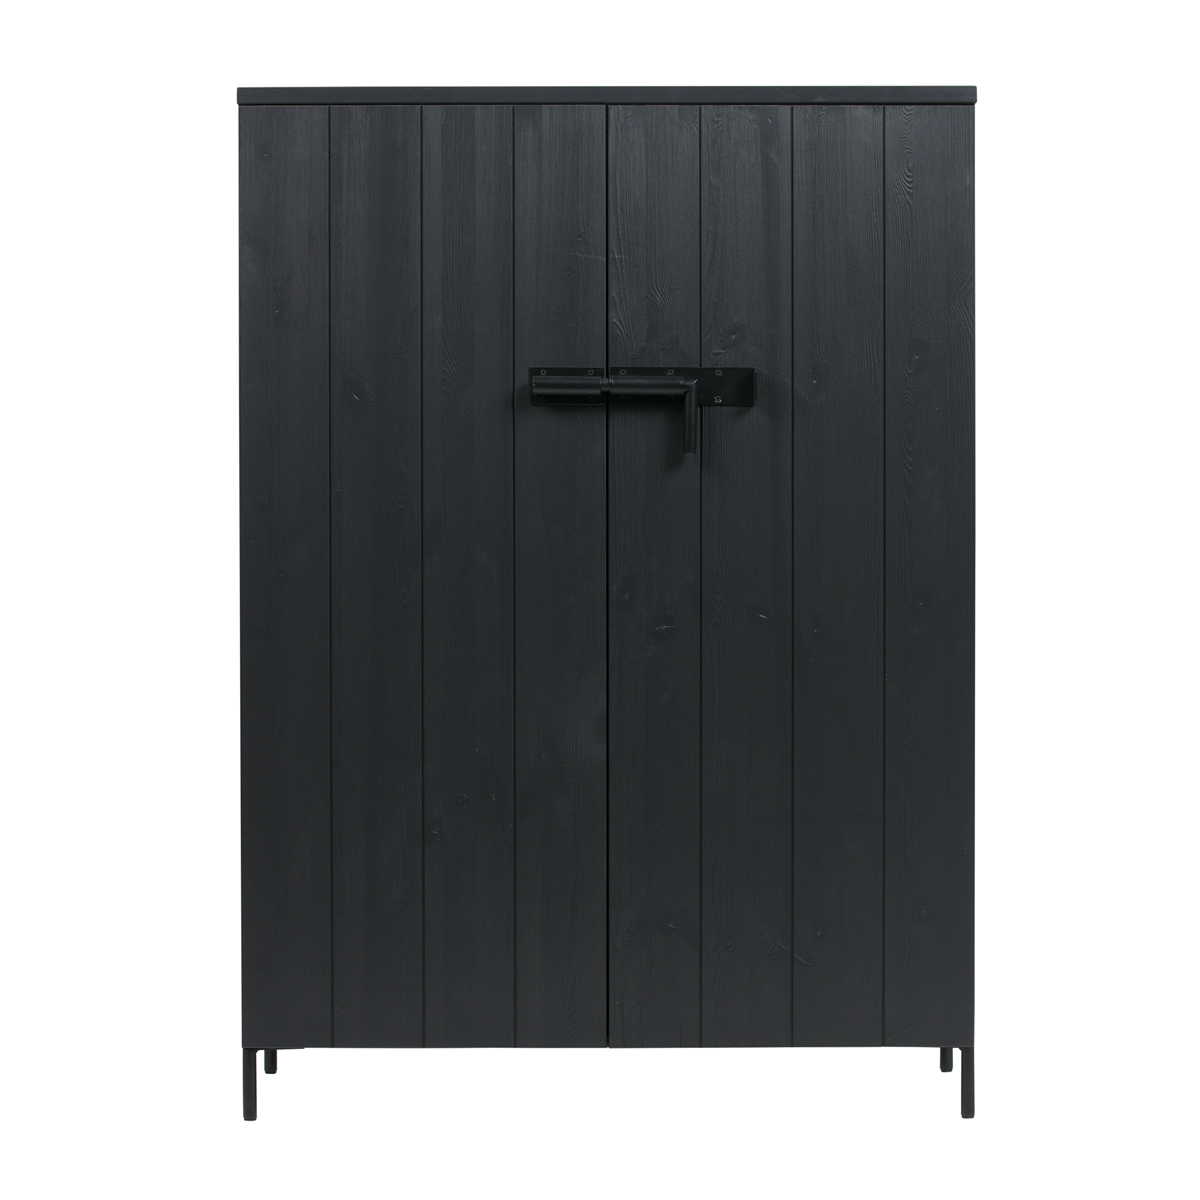 Zwarte houten wandkast